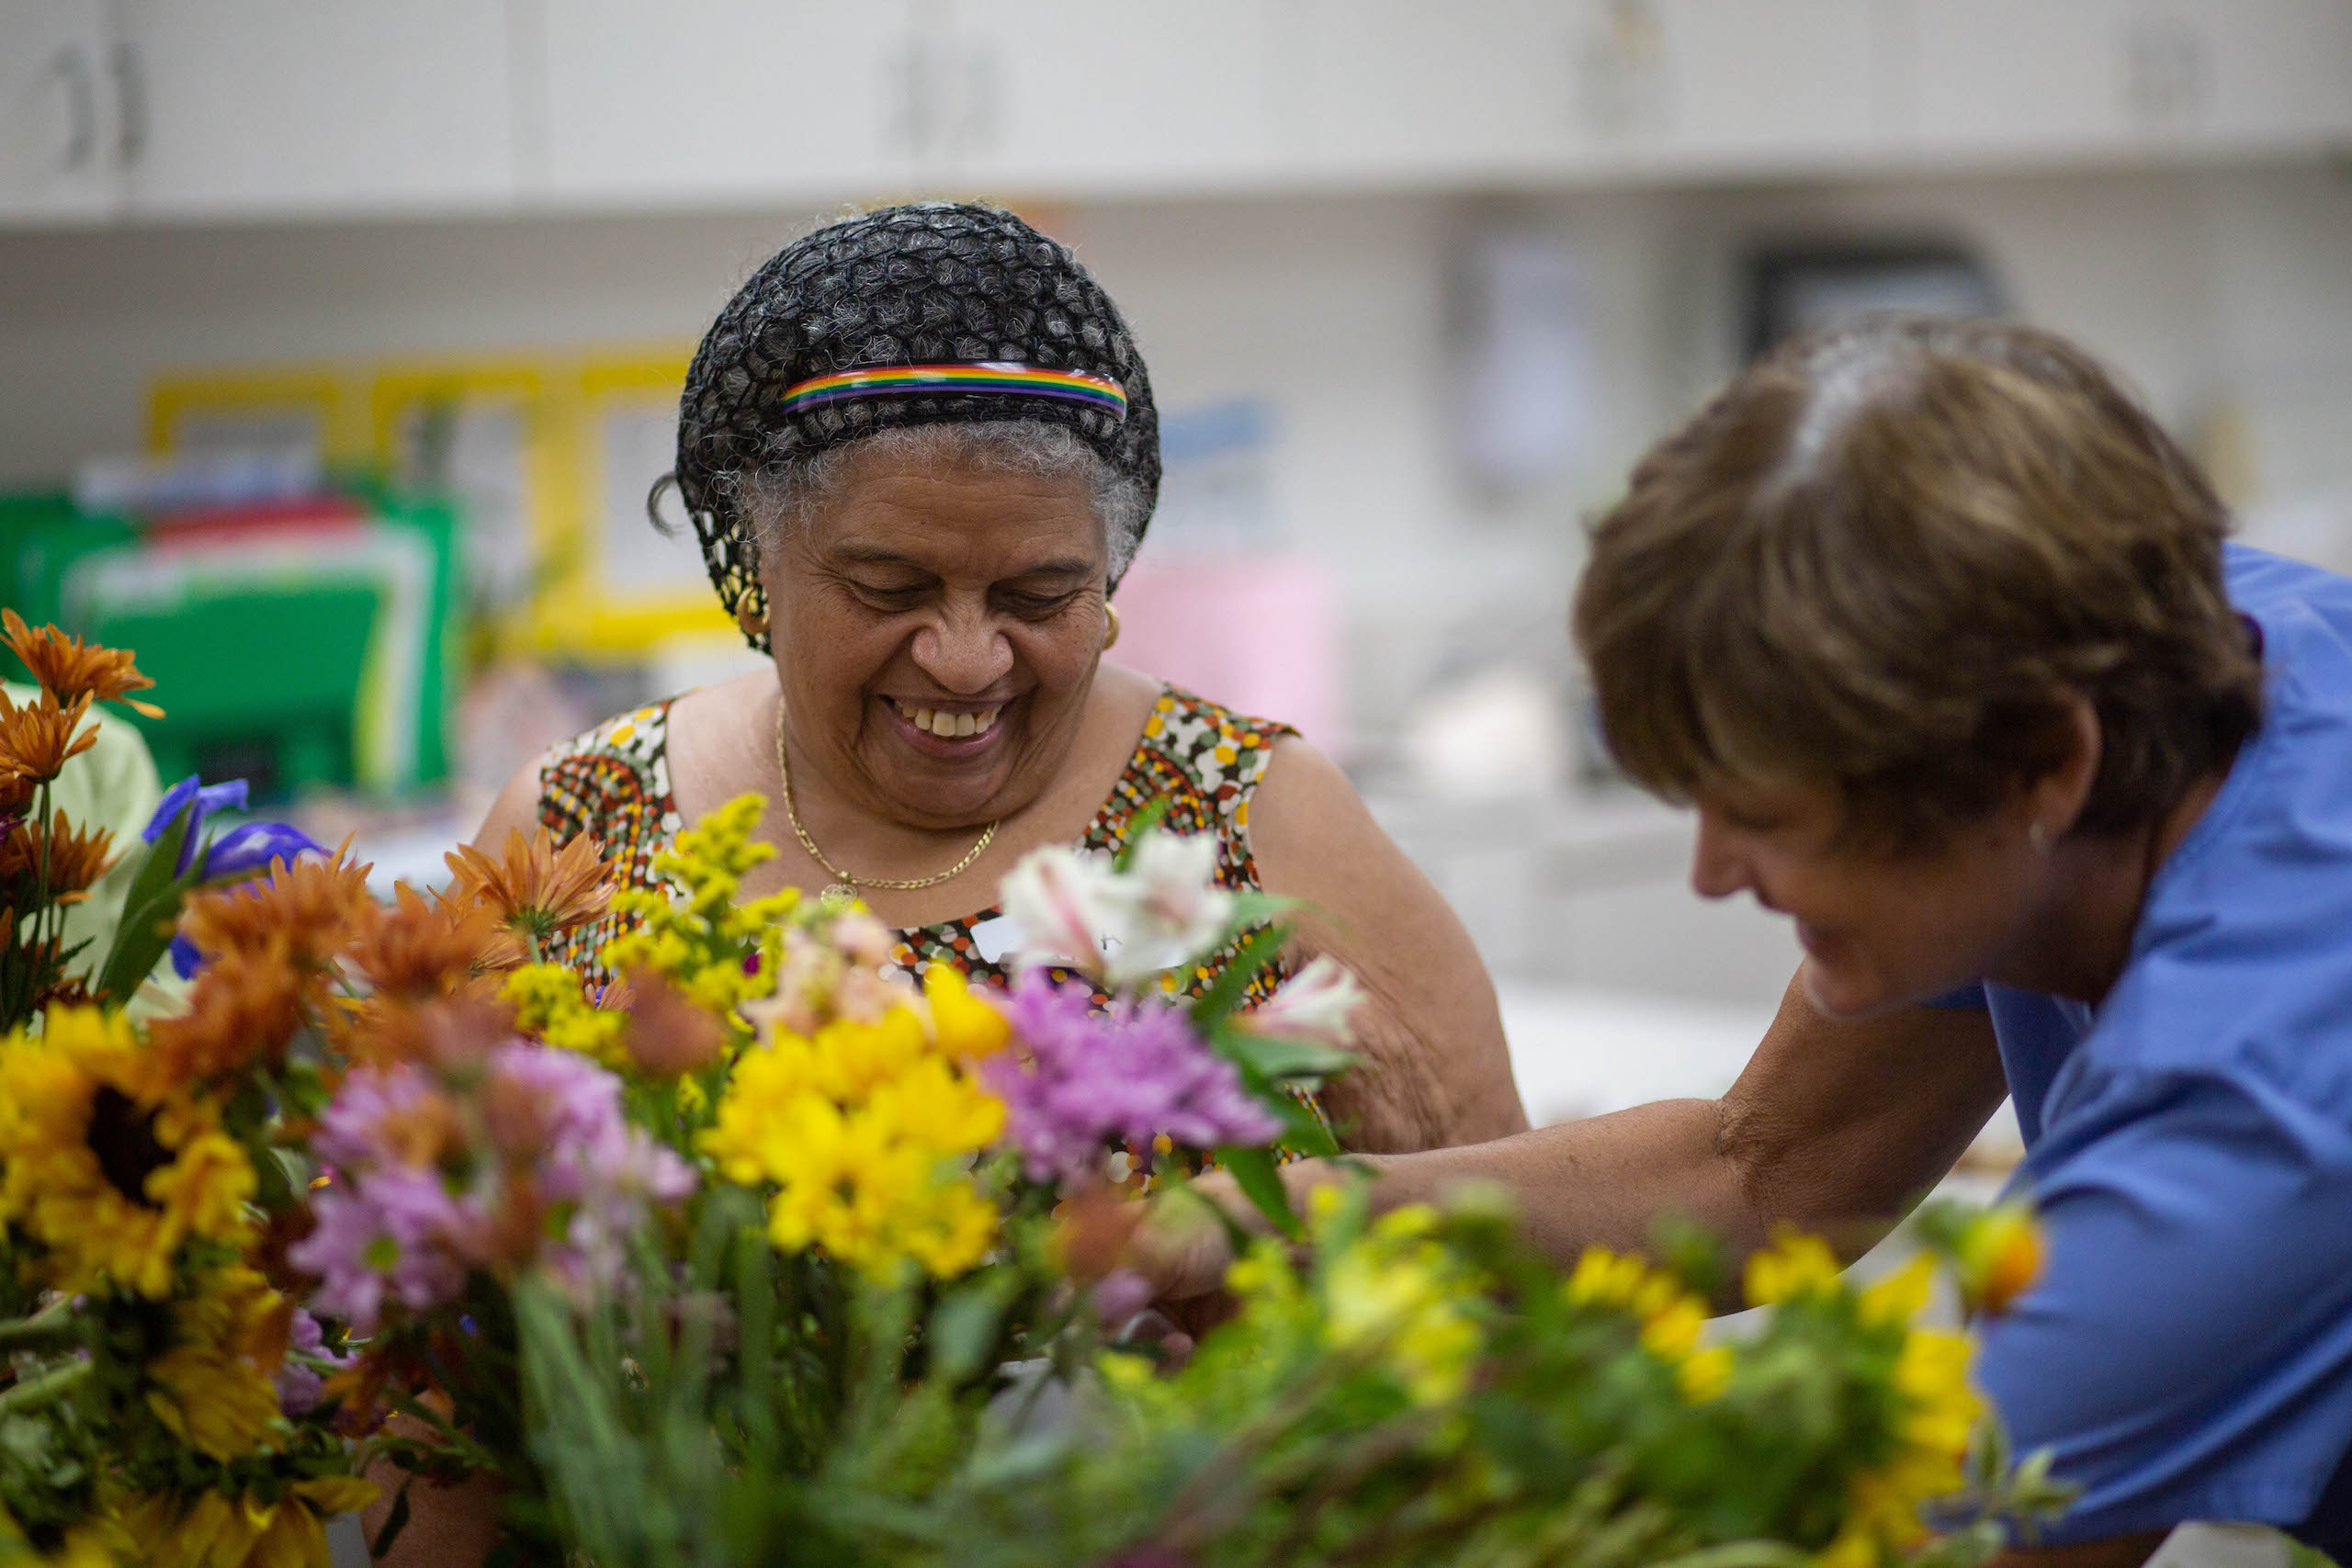 6 Health Benefits of Gardening for Seniors